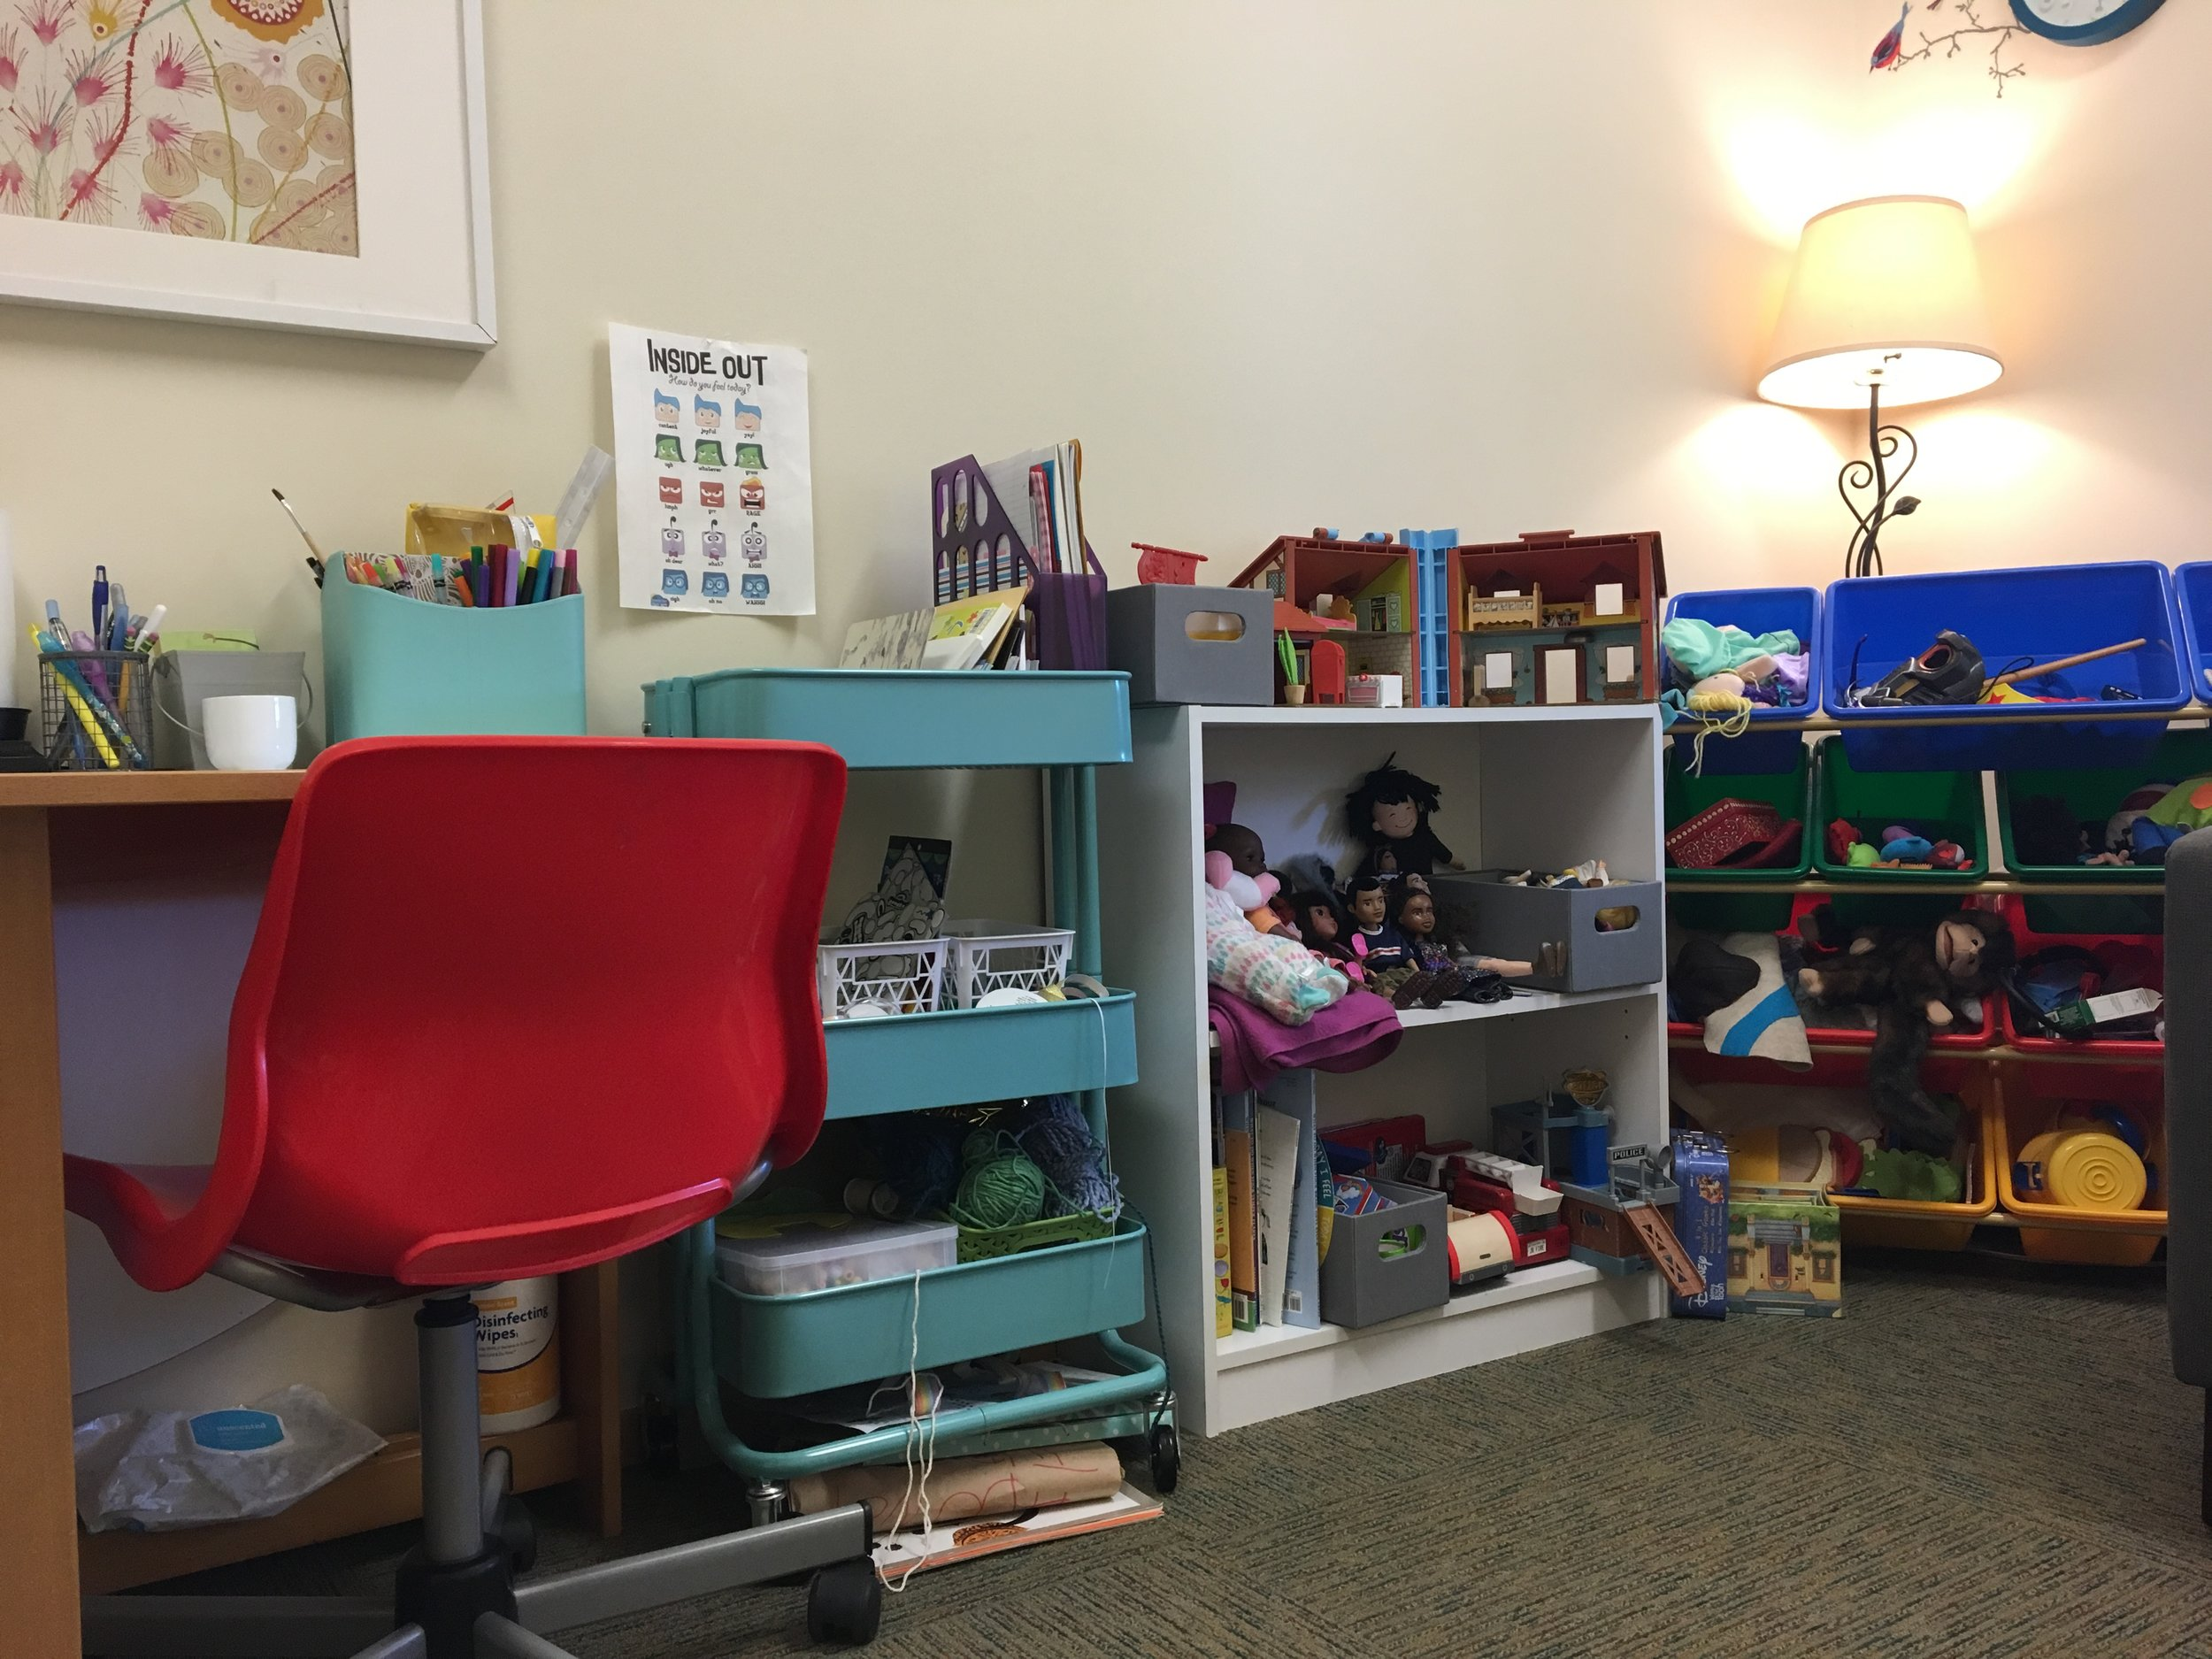 Seattle play therapist Katie Maynard child counselor